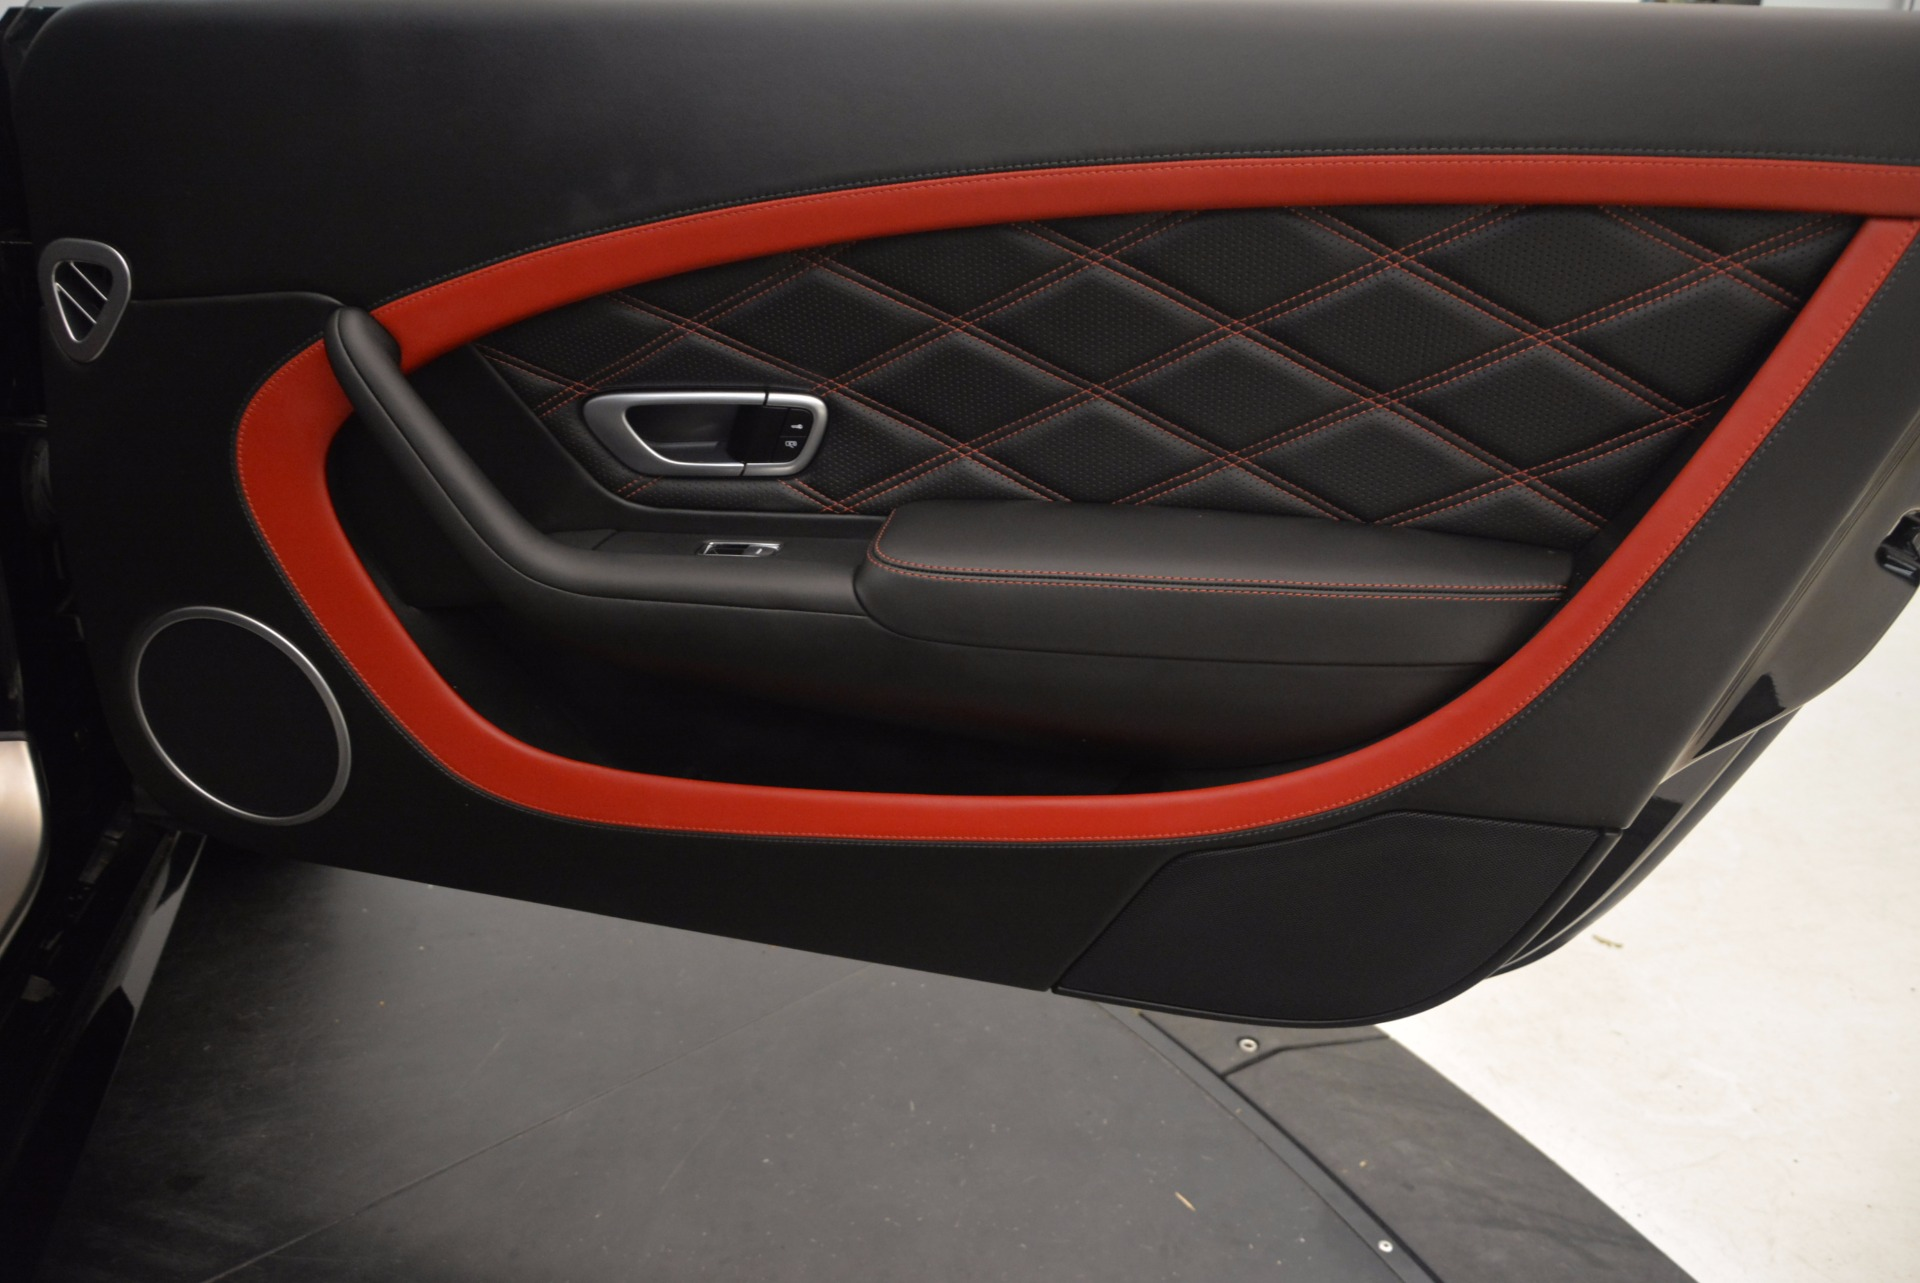 Used 2015 Bentley Continental GT Speed For Sale In Westport, CT 1646_p32